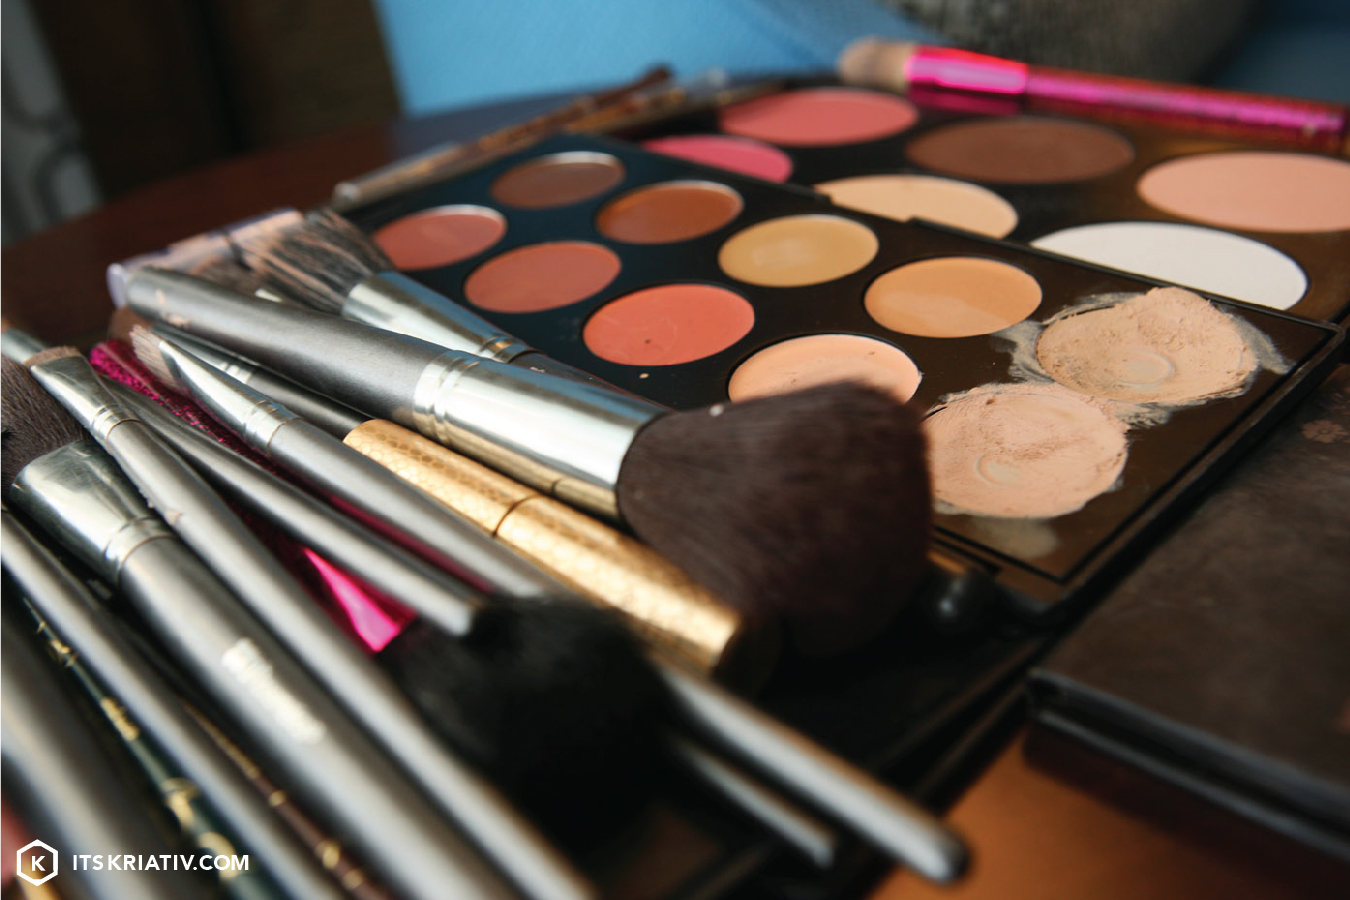 Its_Kriativ_Fashion_Make-Up_Fun.jpg